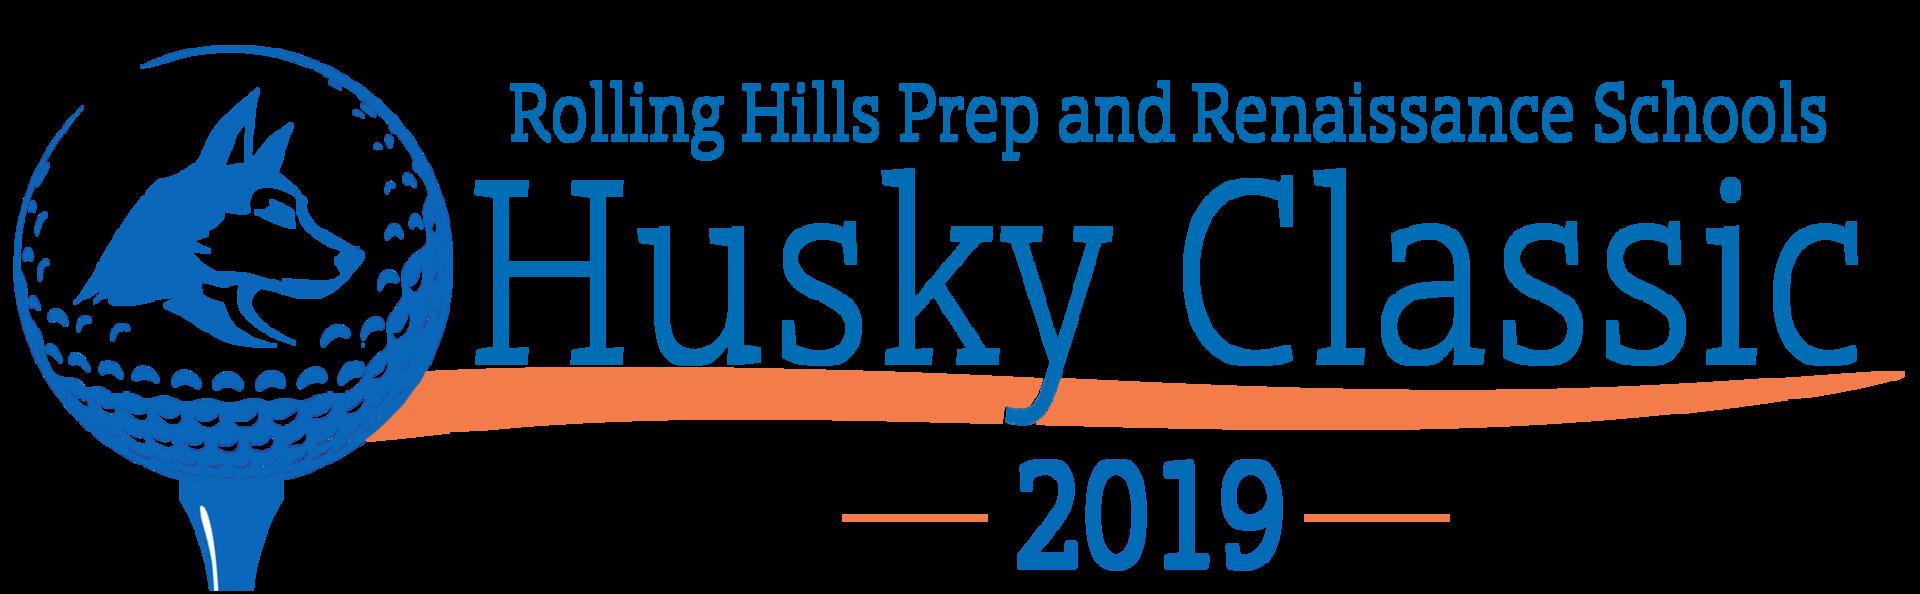 Husky Classic 2019 Logo